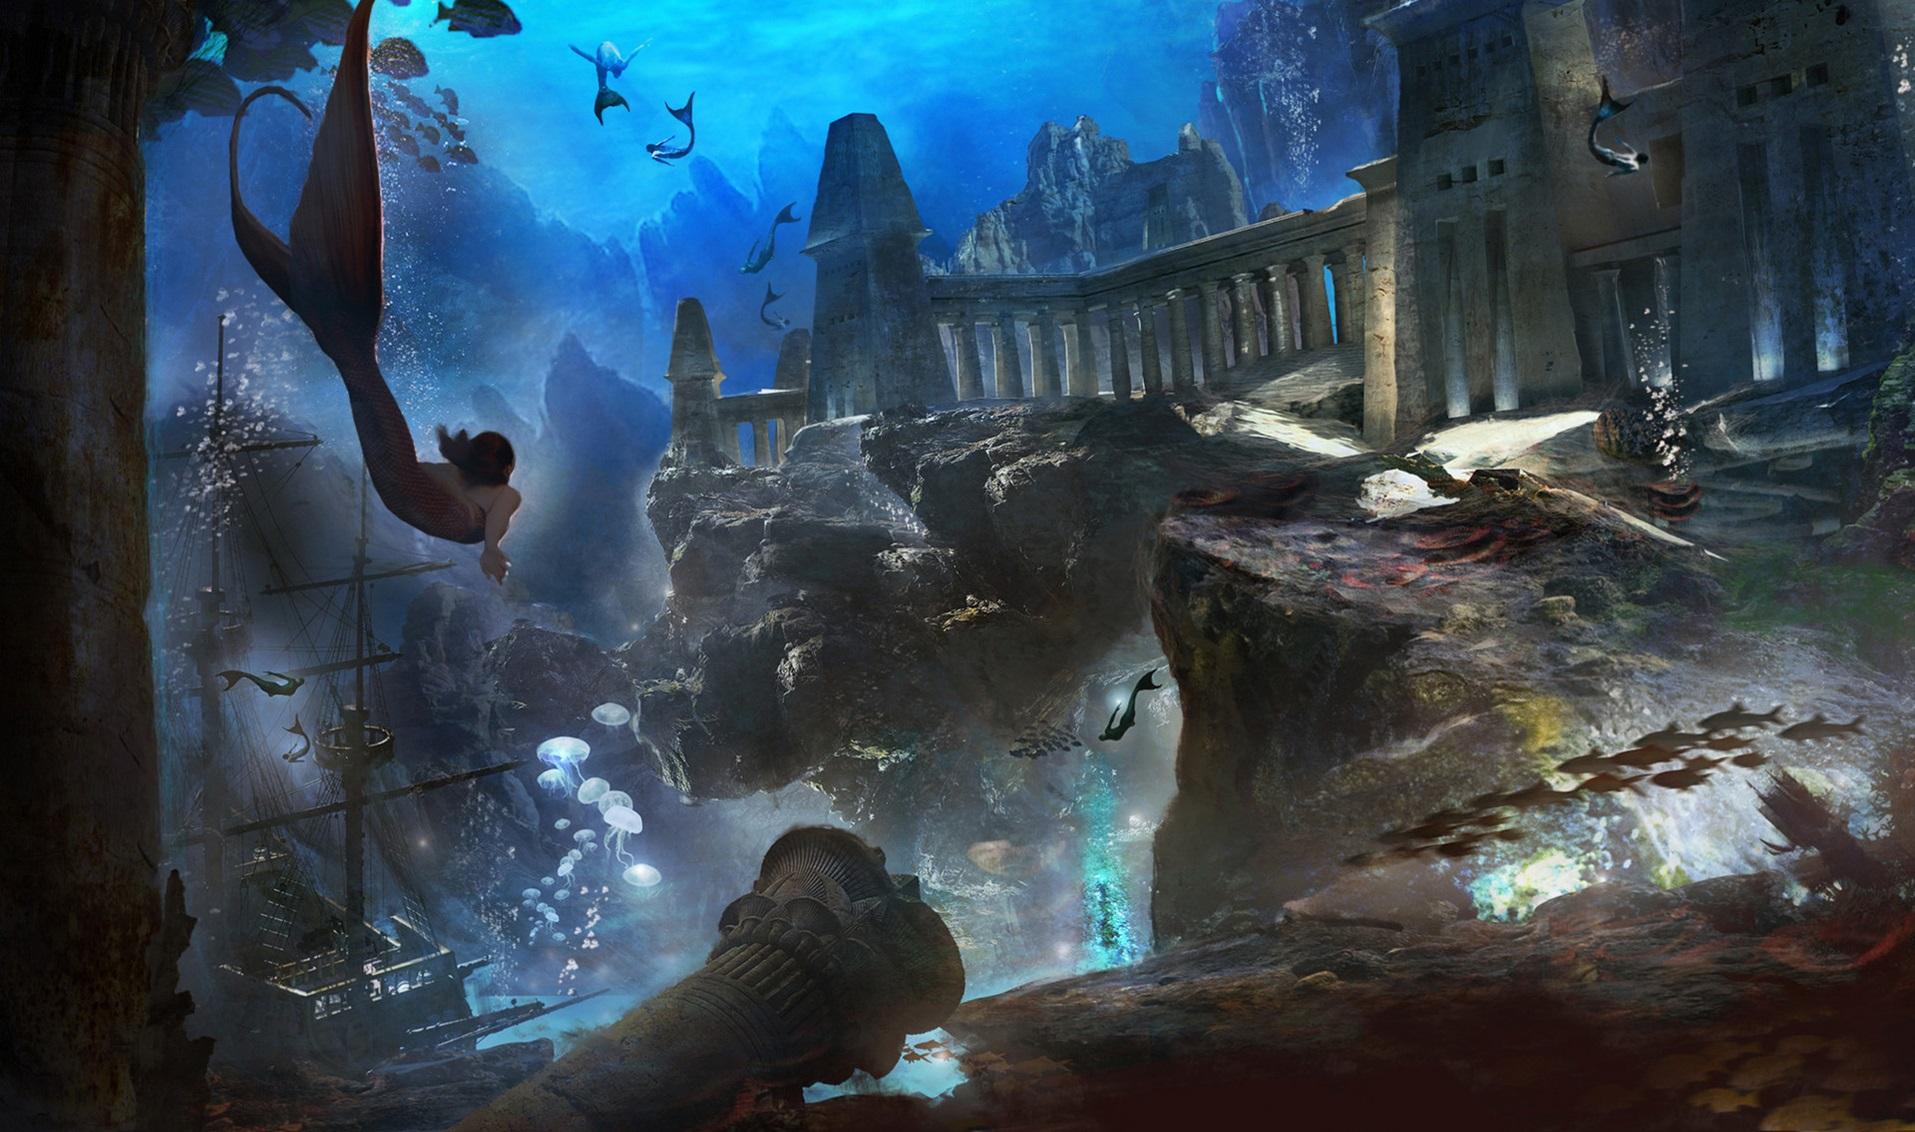 Mermaid Kingdom